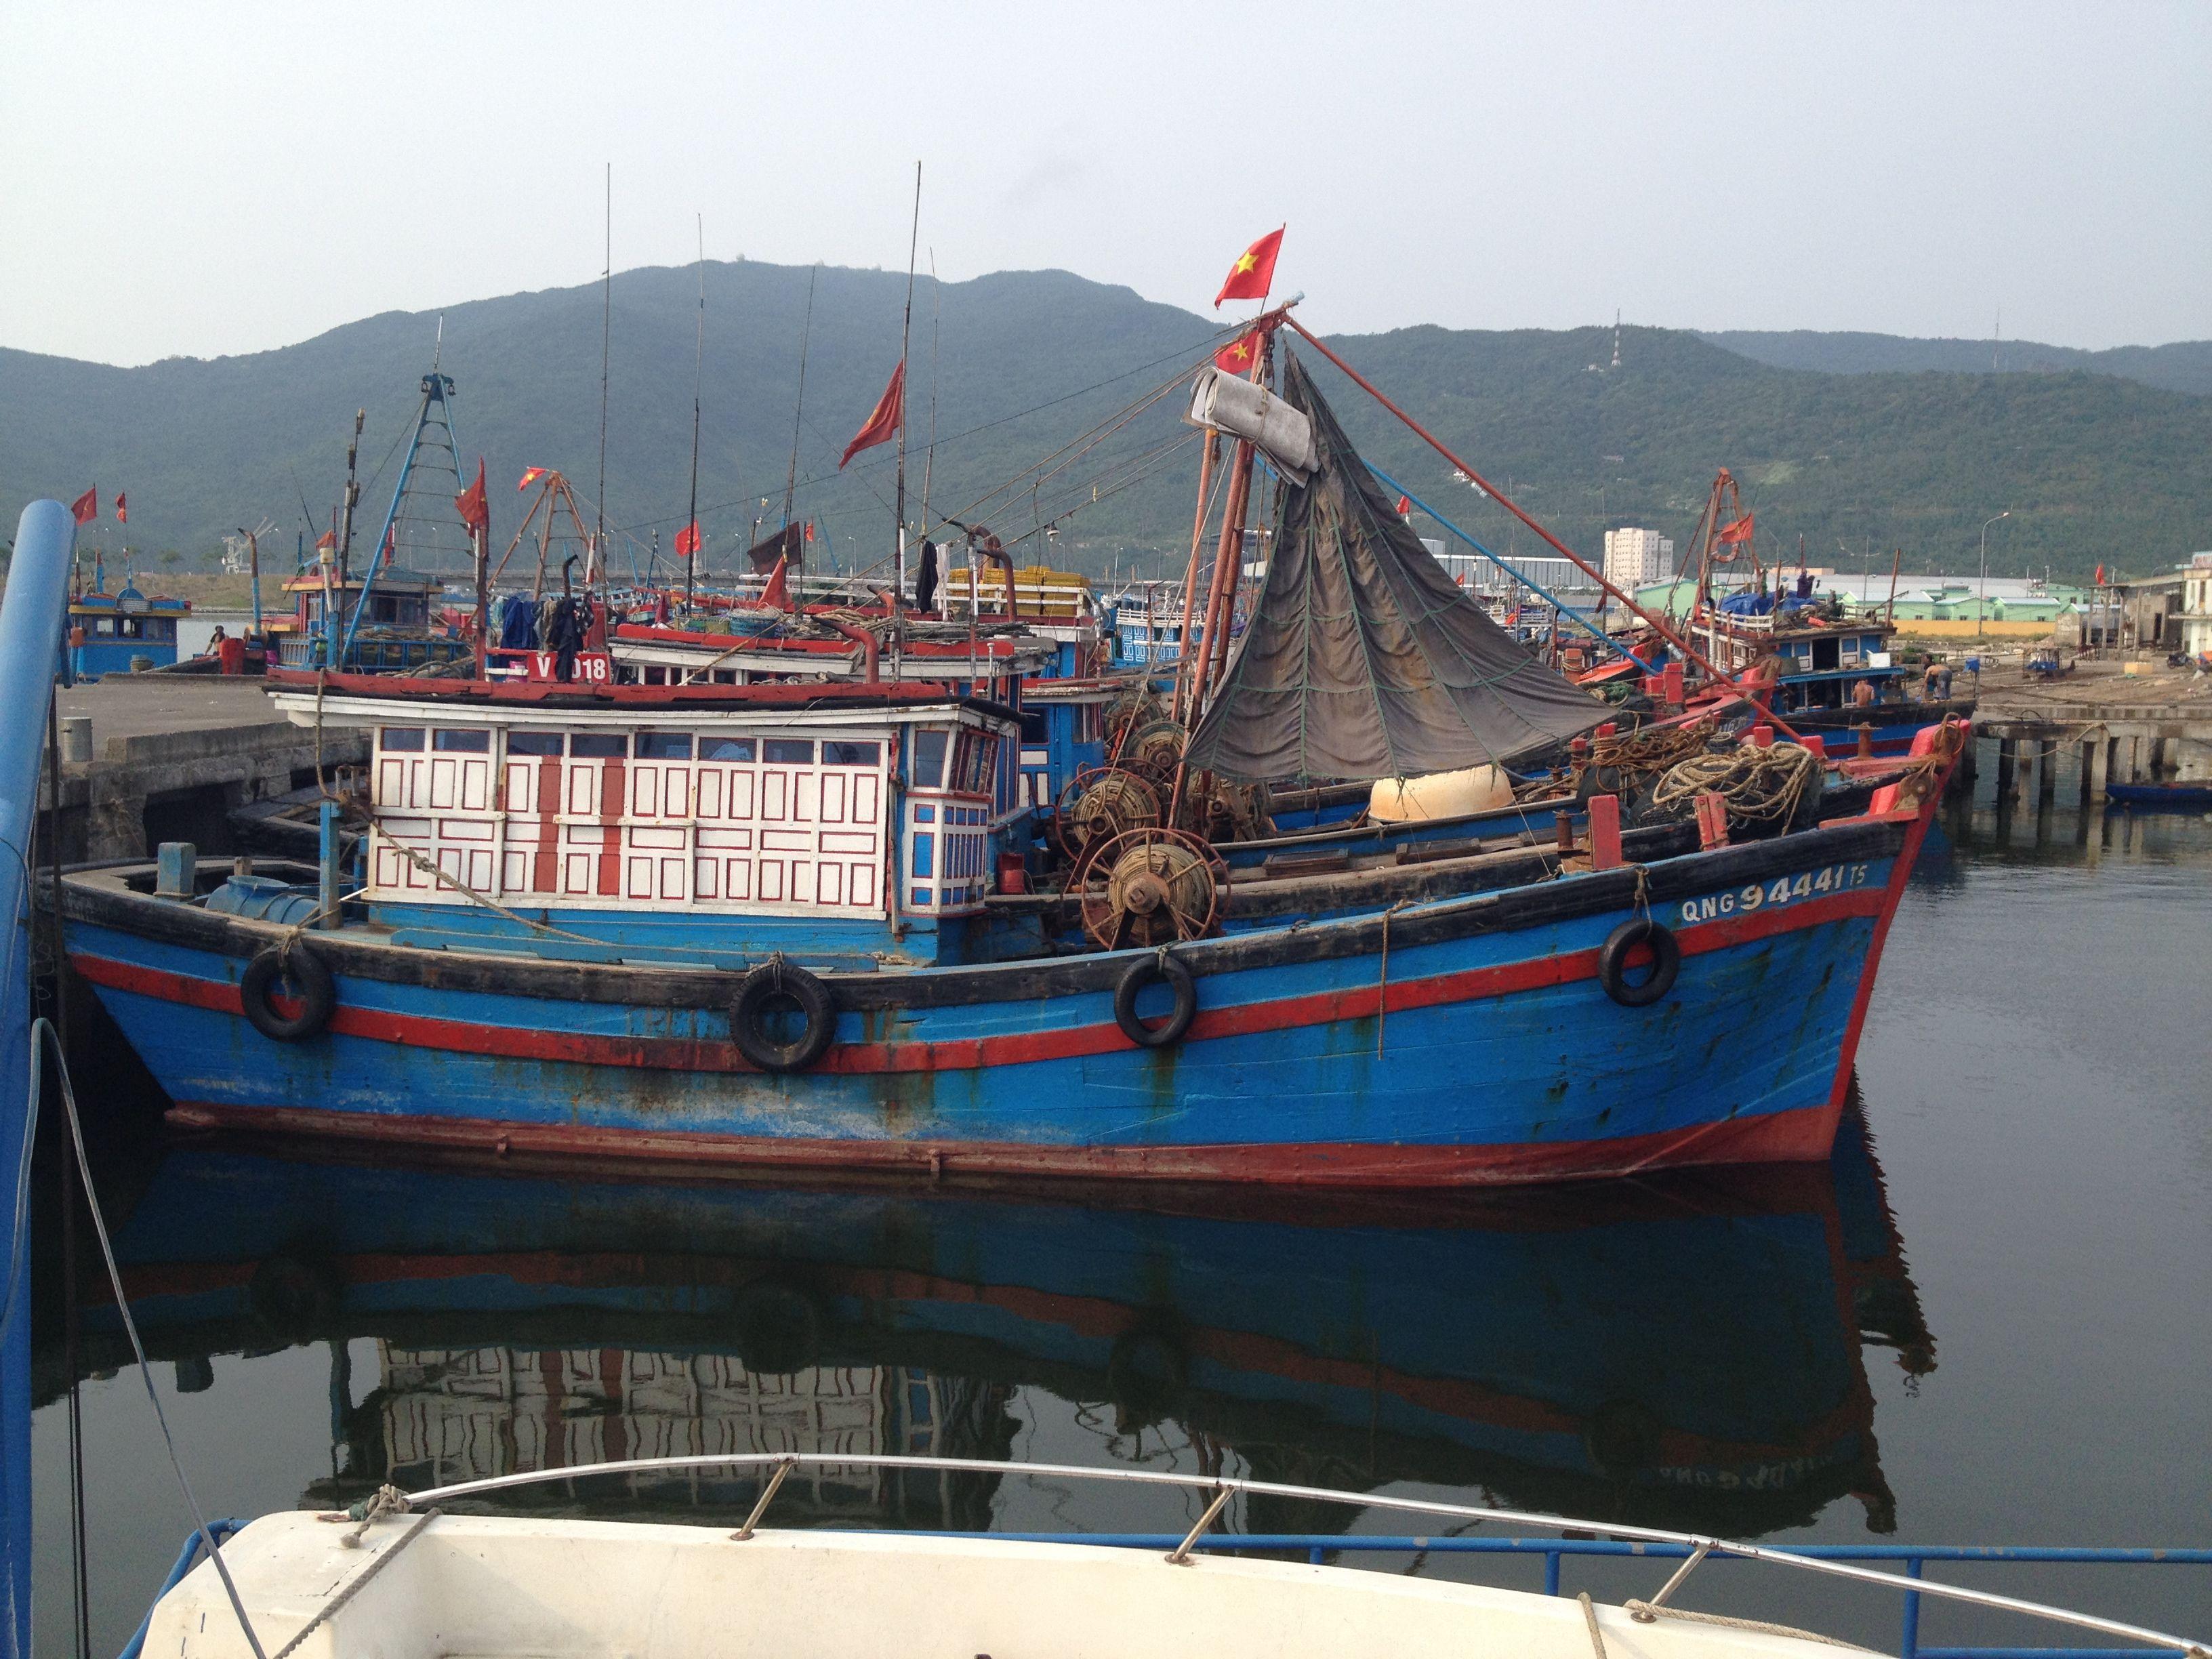 Da Nang City harbor | Da Nang Region Vietnam #3TBBC #NHTV ...